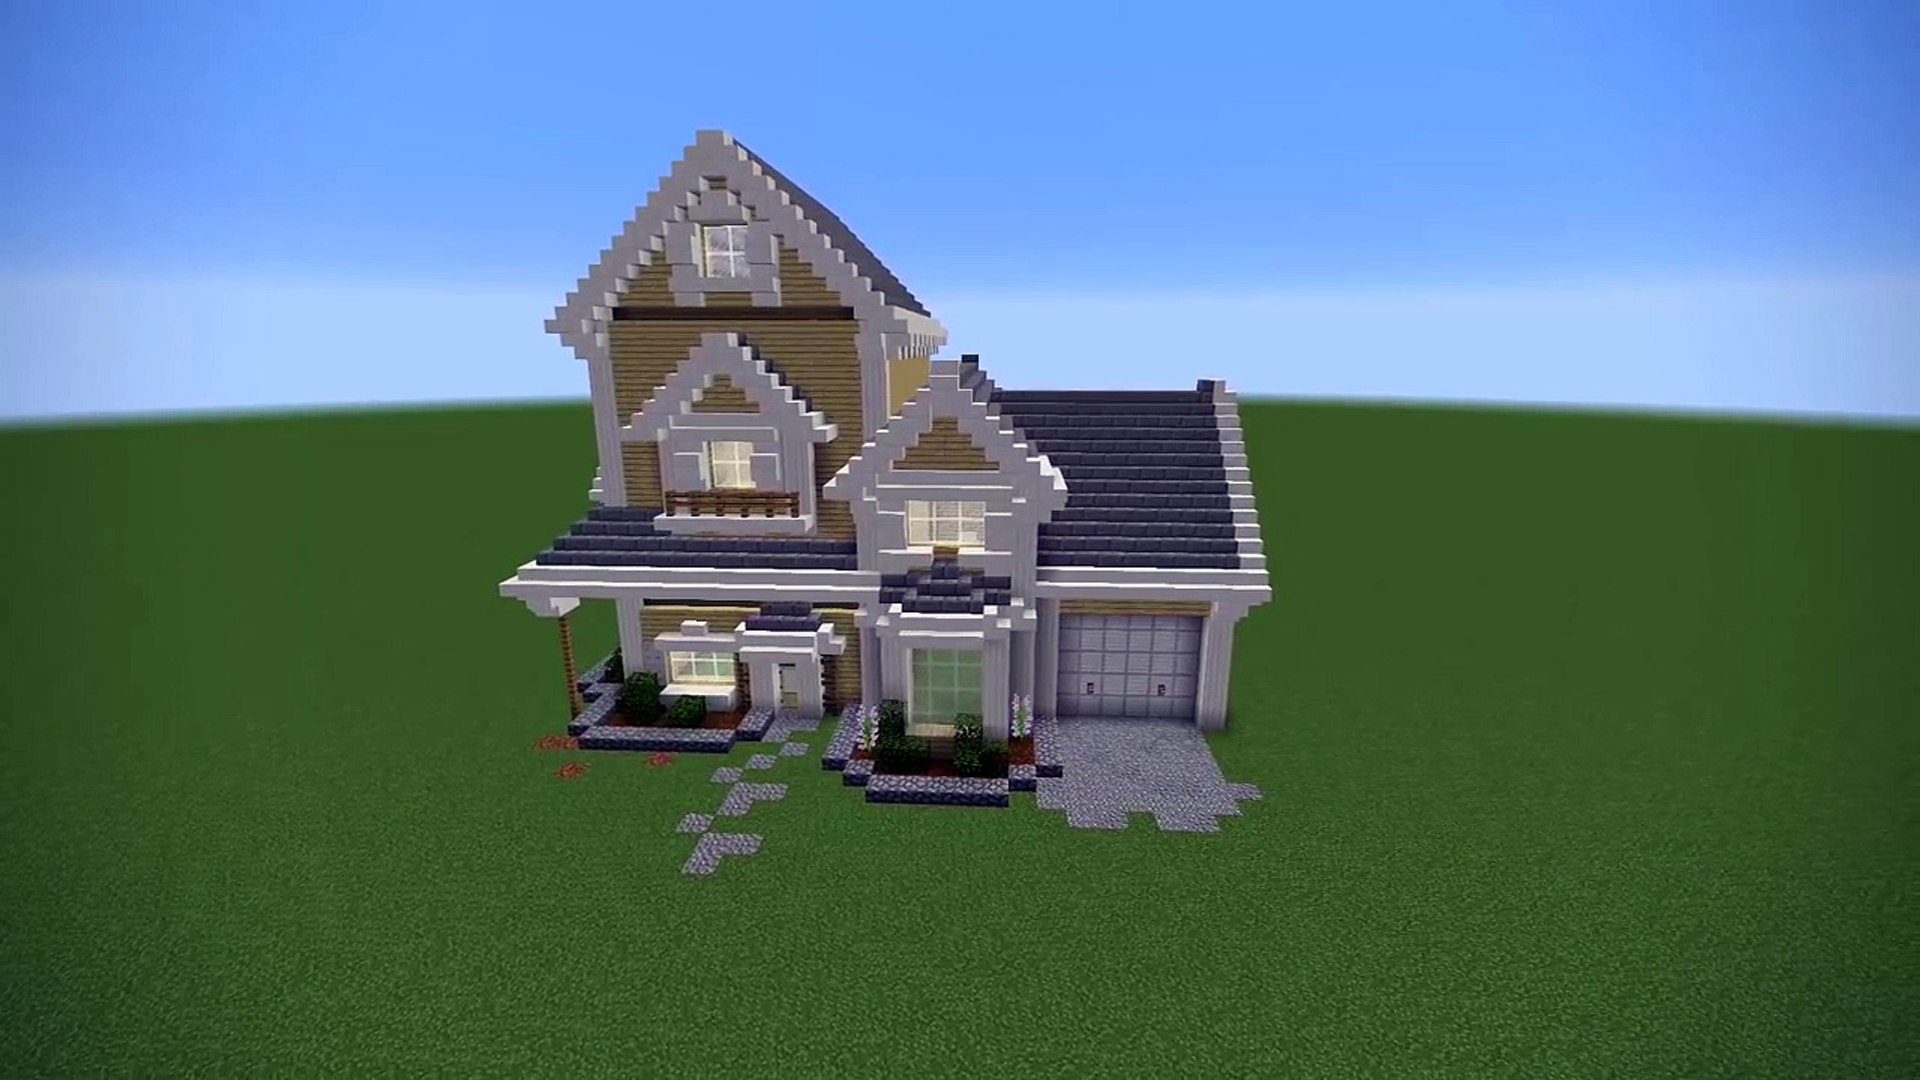 Minecraft Suburban House Tutorial Minecraft House Video Dailymotion